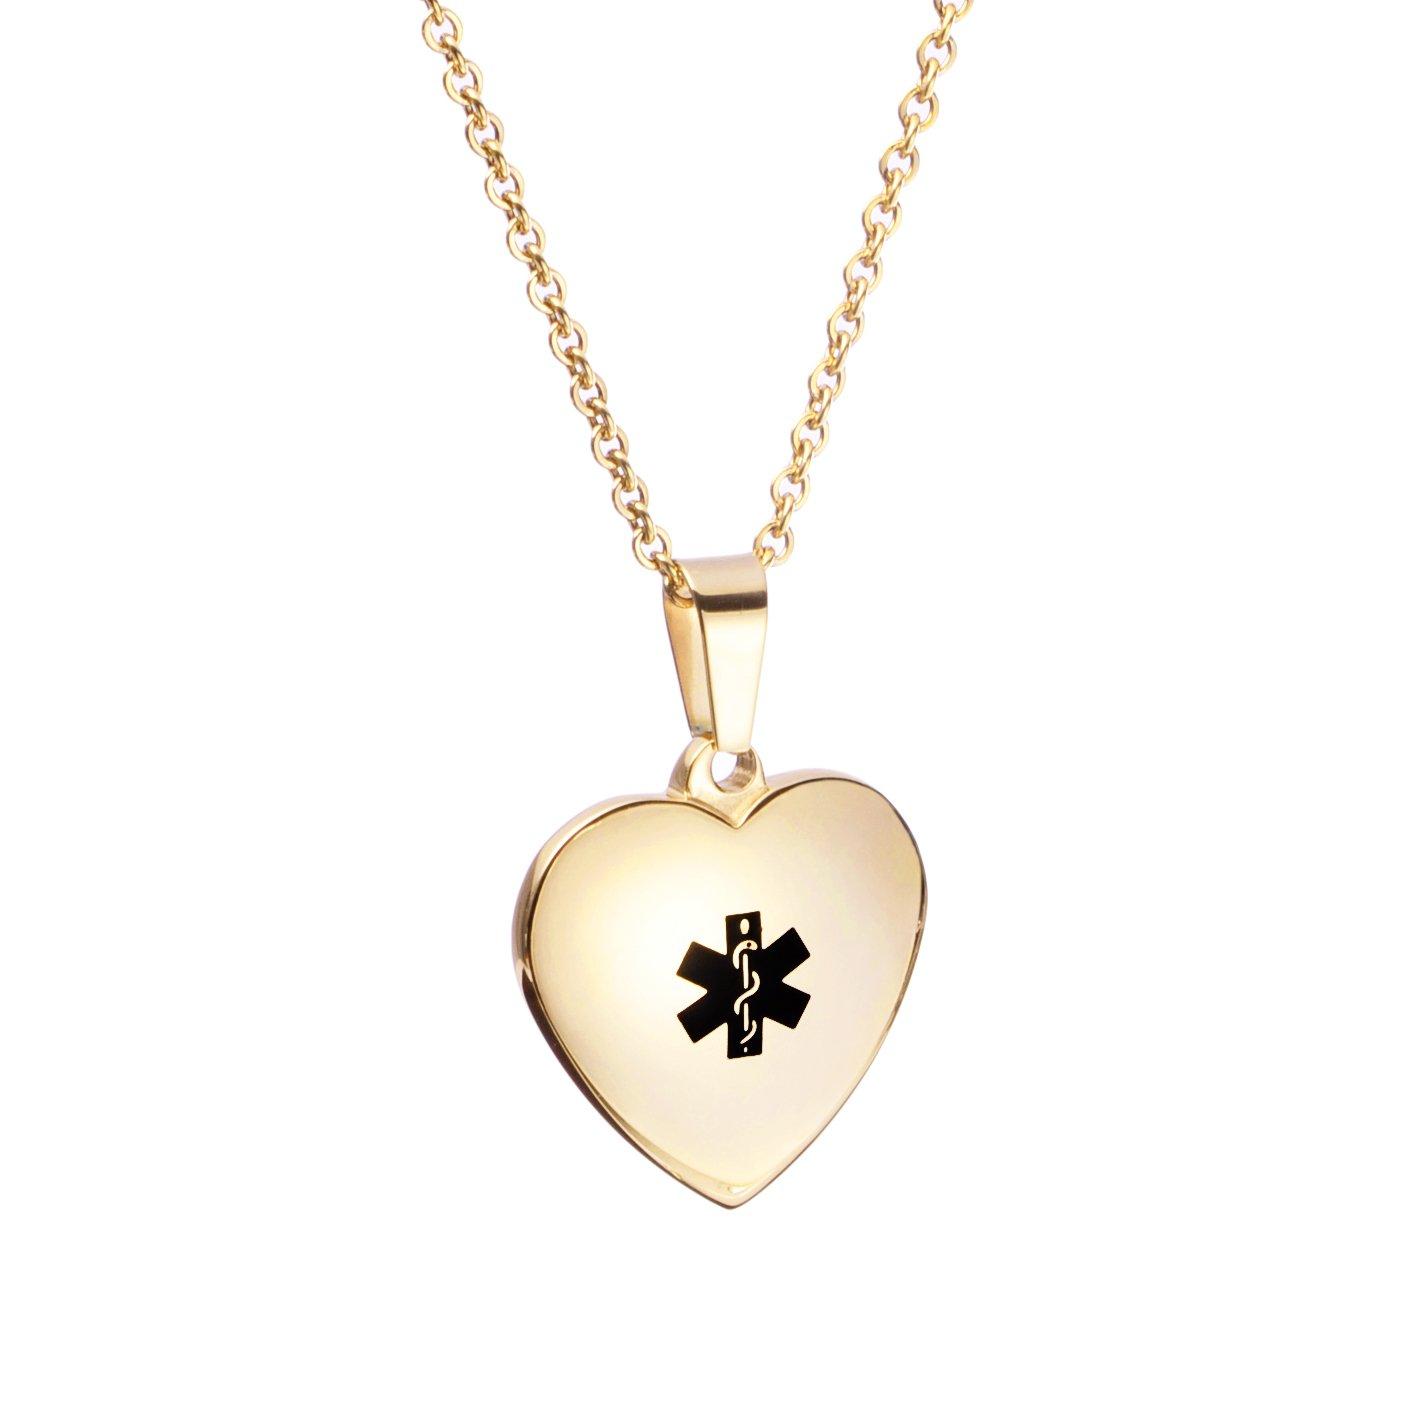 Free Engraving Heart Charm Medical ID Alert Necklaces for Women & Girl LinnaLove MP-0236-BK